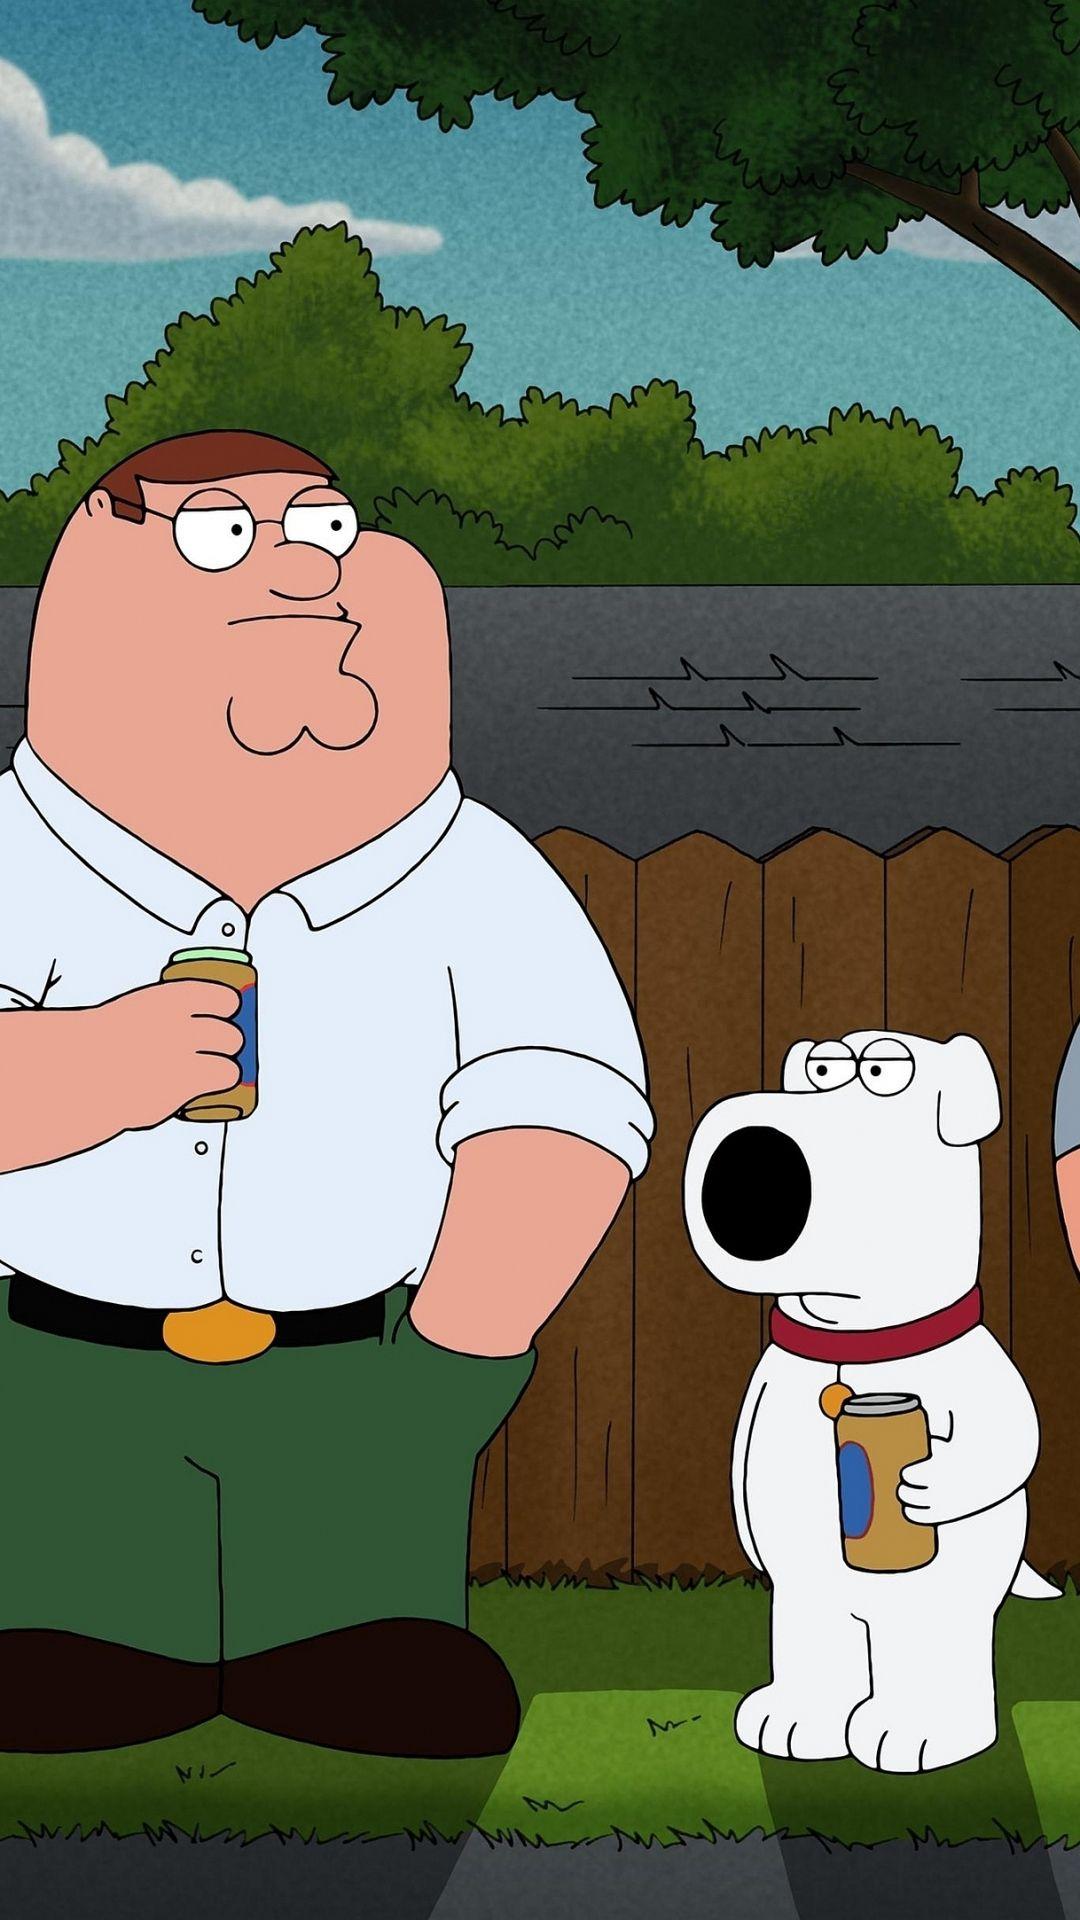 10 Family Guy Appleiphone 7 Plus 1080x1920 Wallpapers for